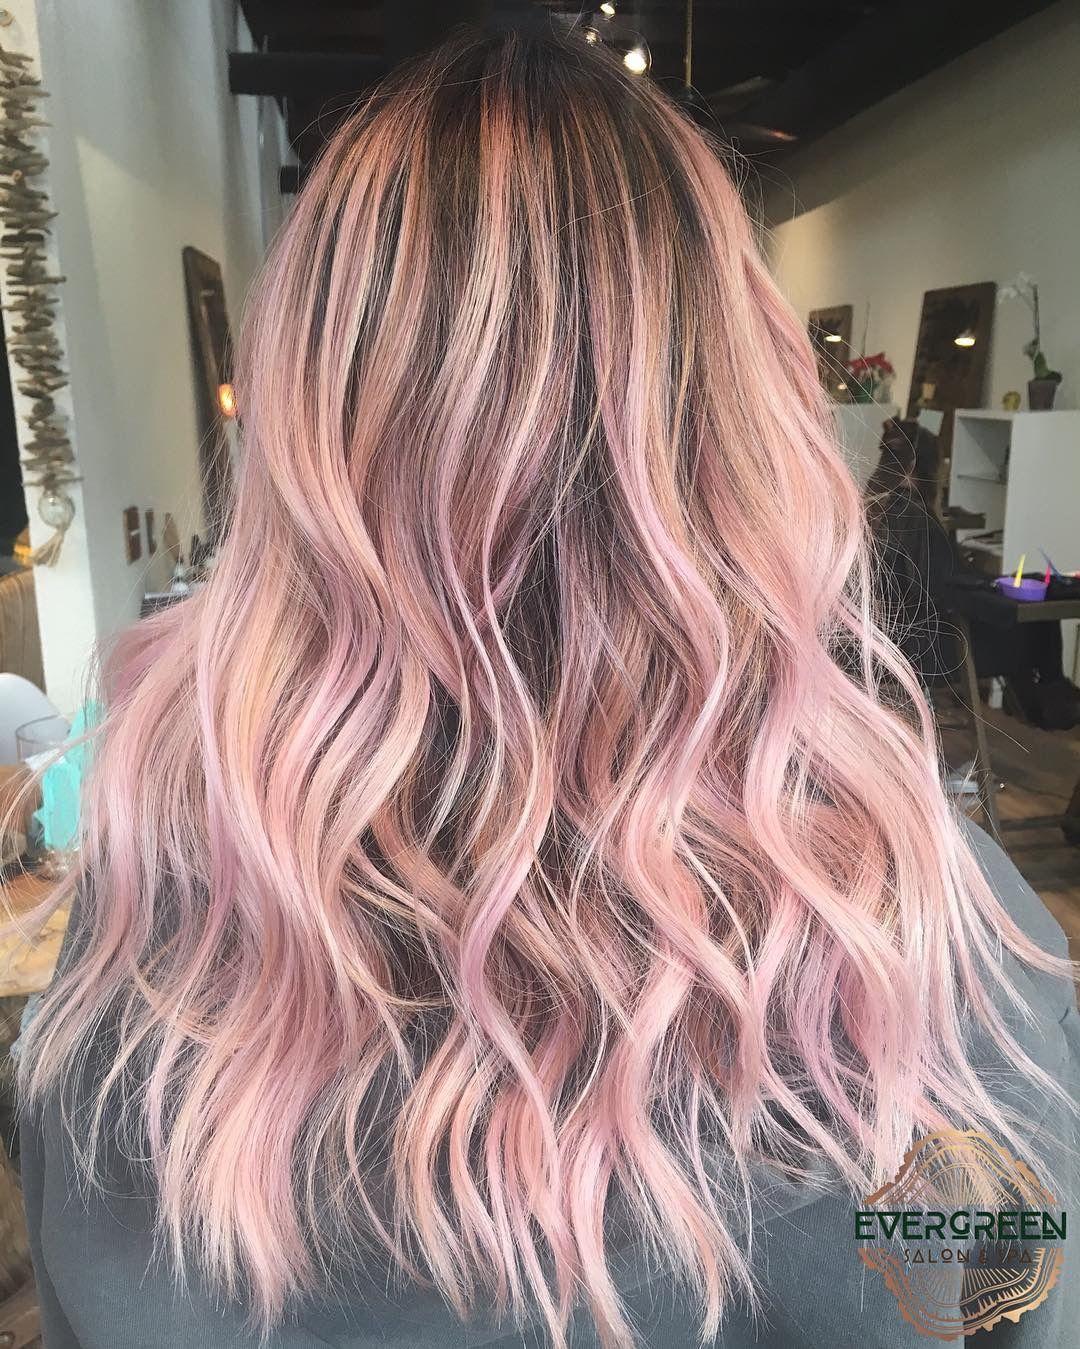 Pink Color Pastel Hair Medium Long Length Wavy Curls Light Pink Hair Hair Styles Medium Hair Styles